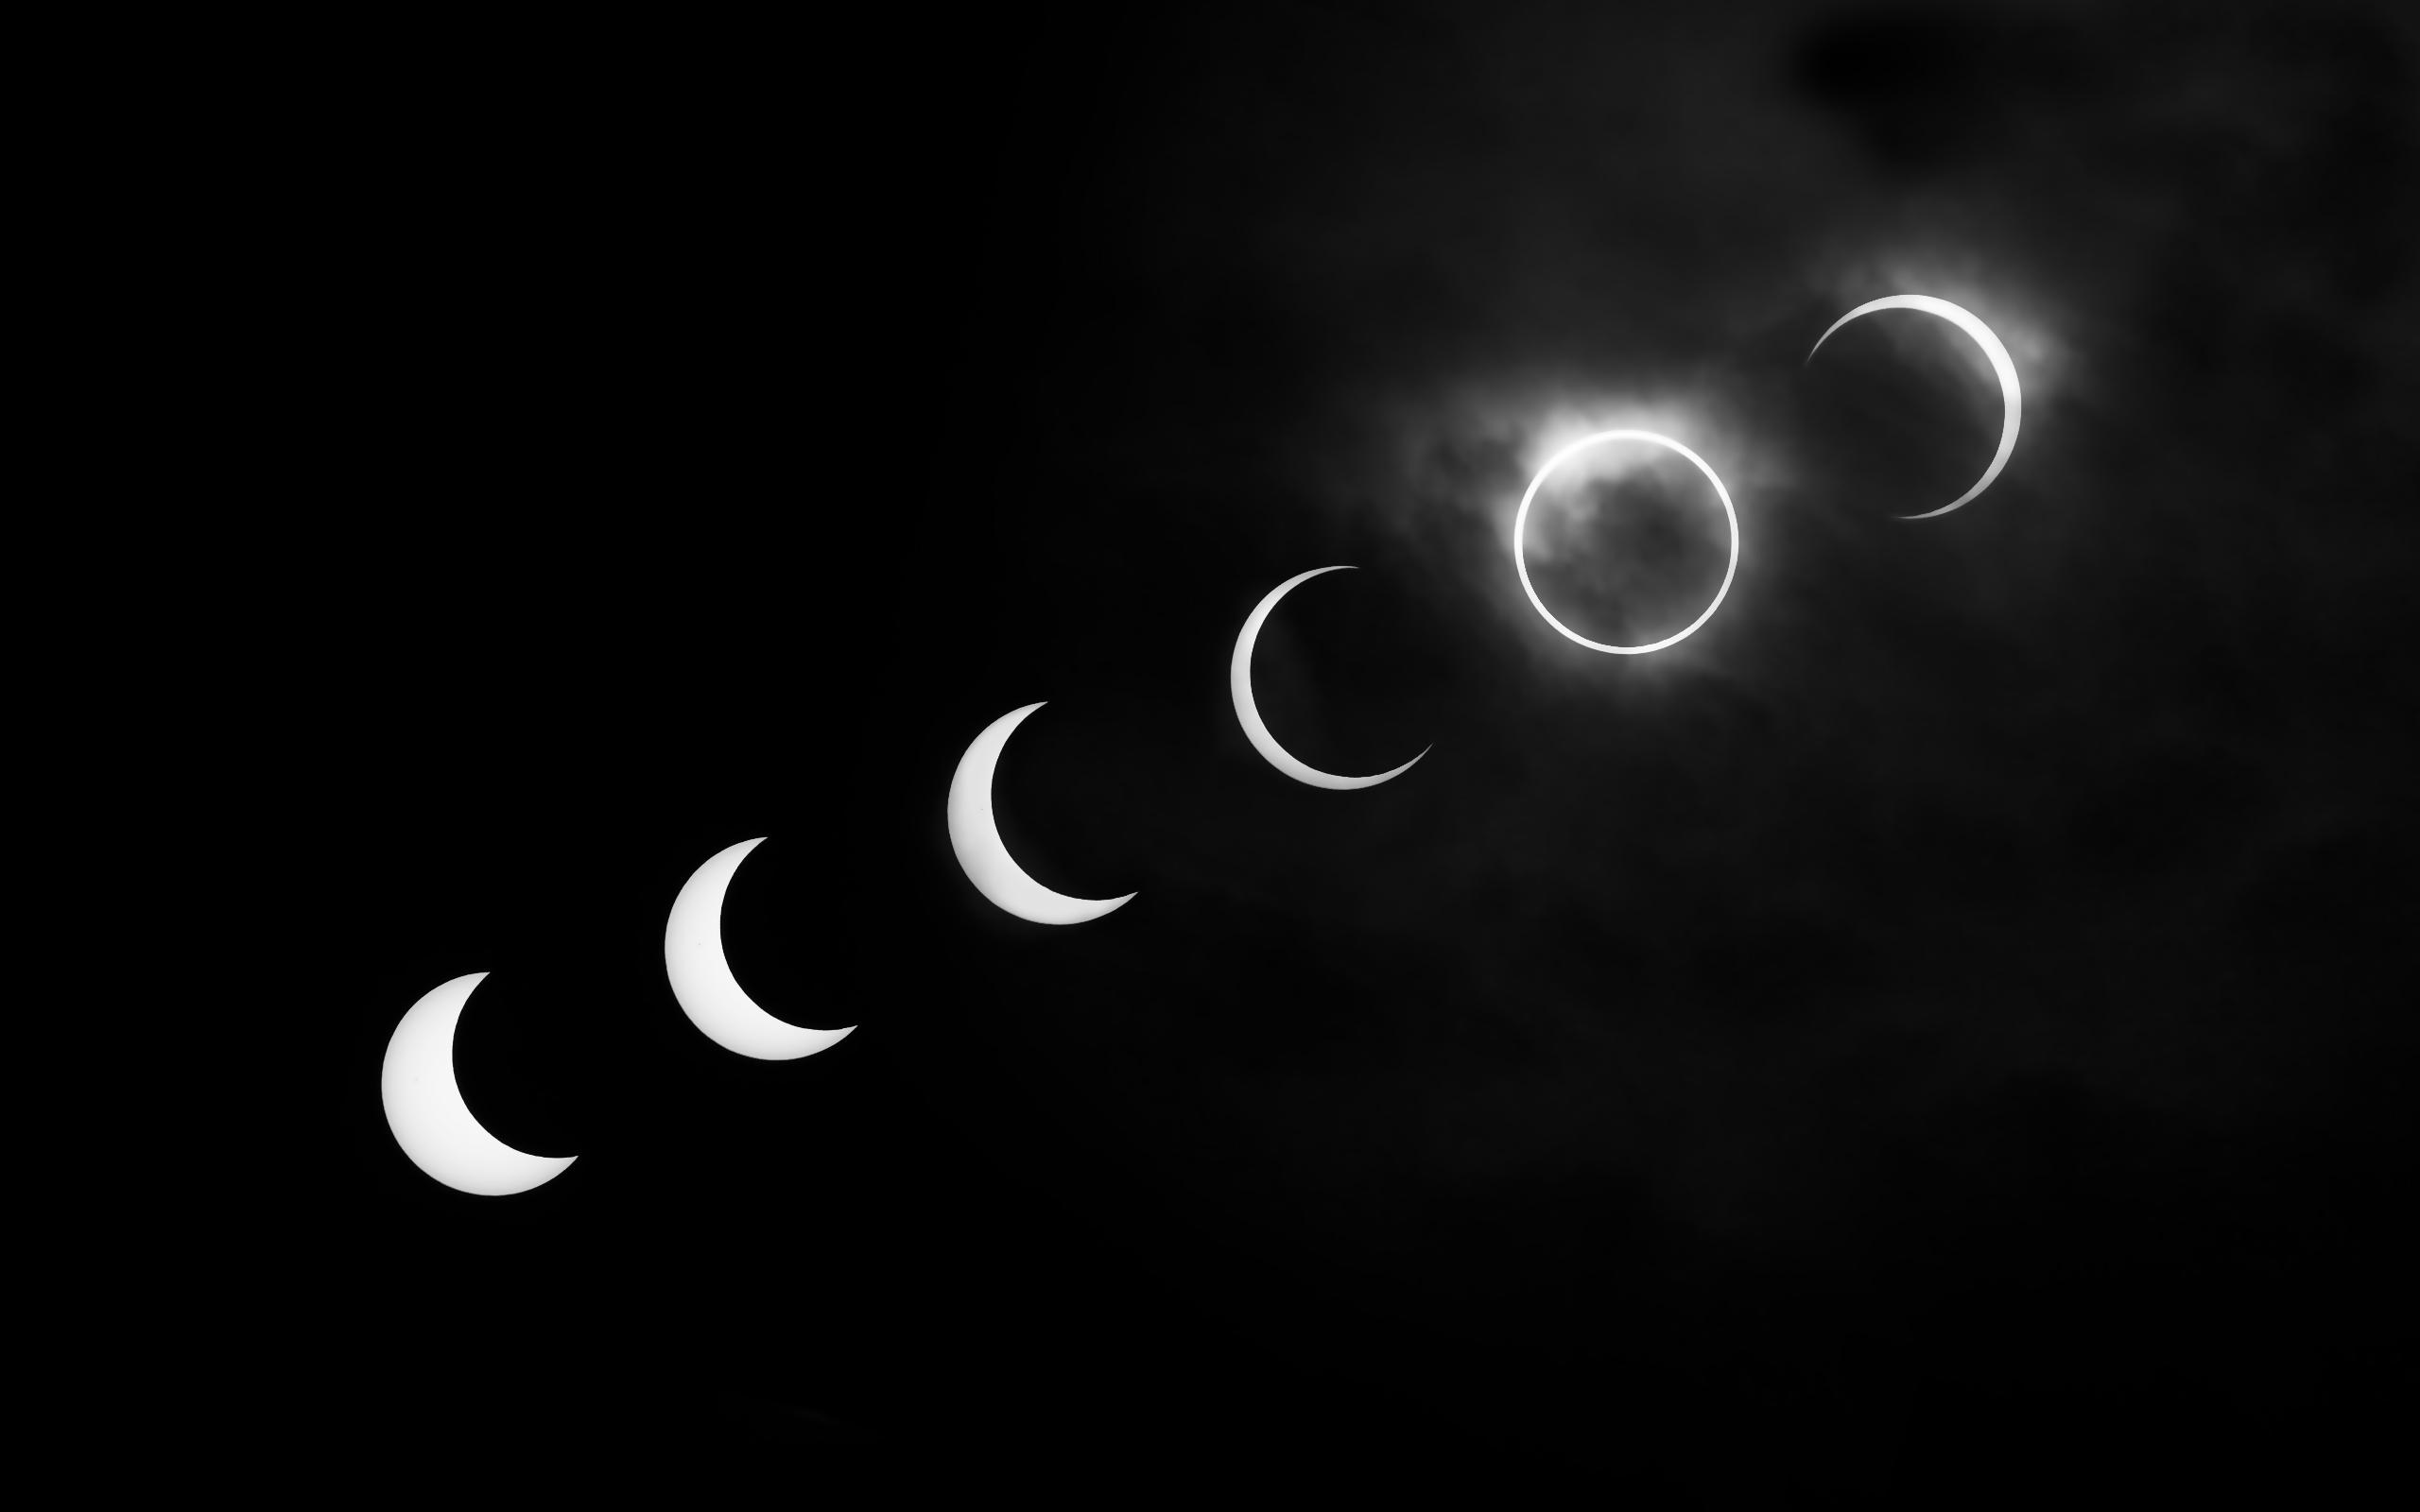 Solar eclipse black and white desktop wallpaper 2560x1600